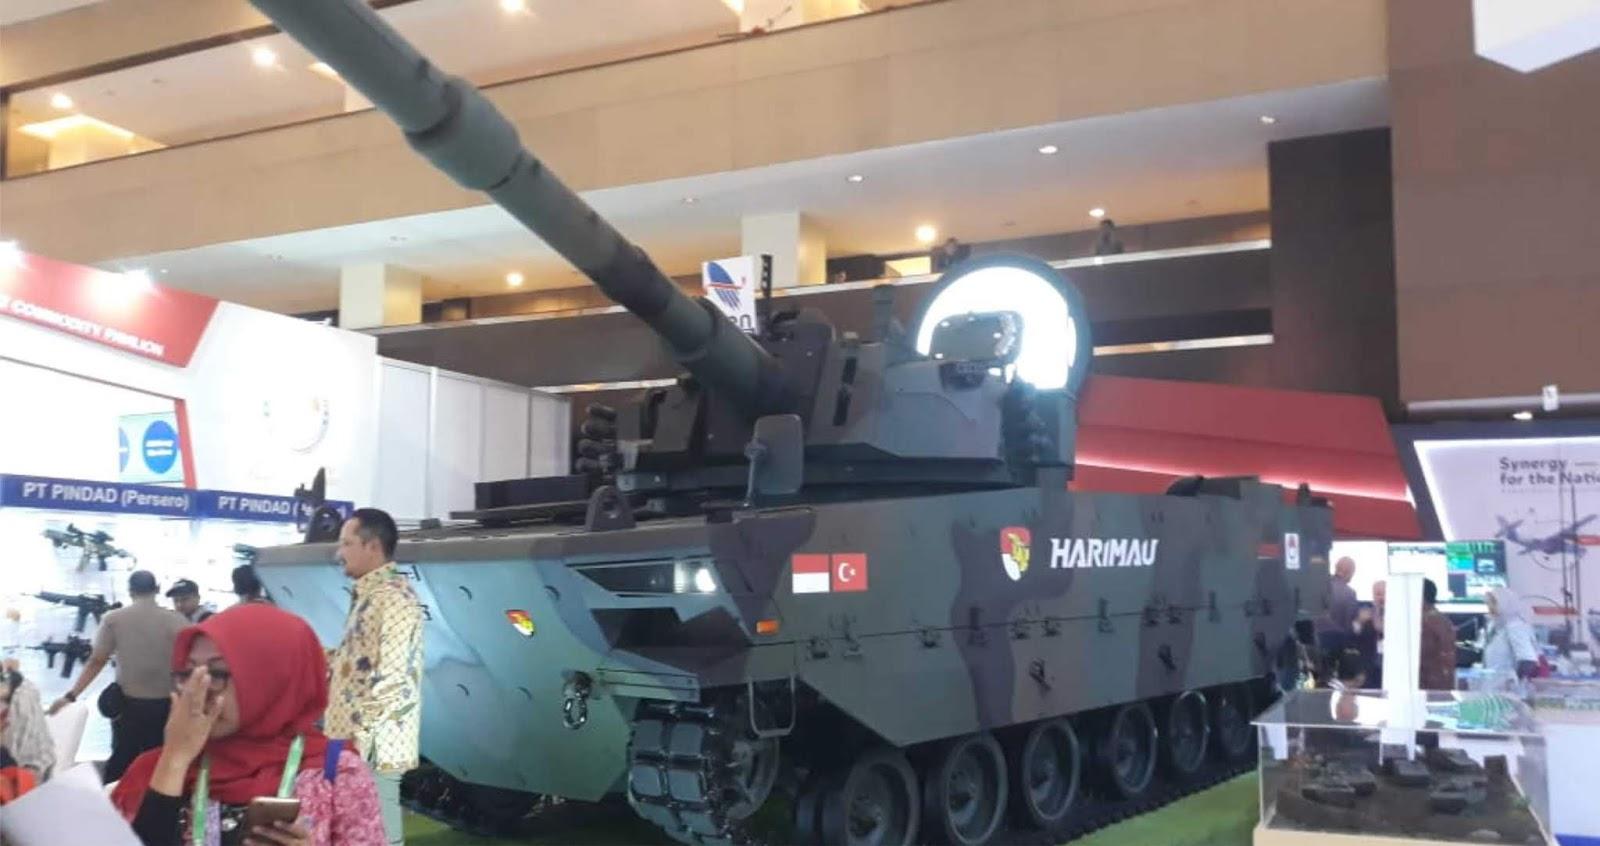 Pada Indo Defence 2018 Expo & Forum Medium Tank Pindad Ikut Dipamerkan